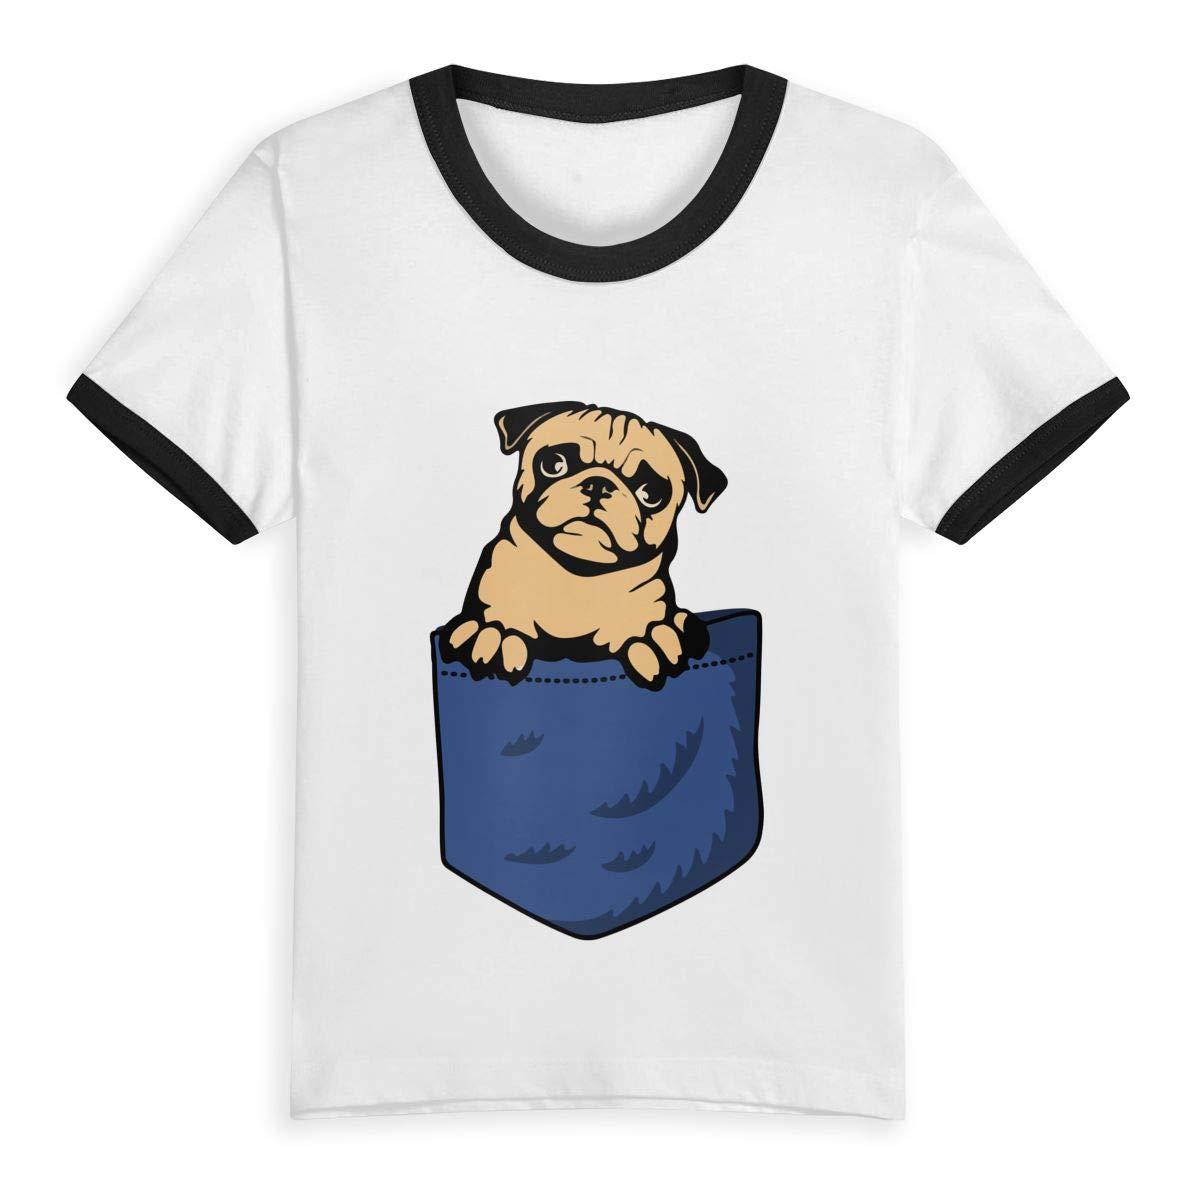 UGFGF-S1 Pocket Pug Fashion Toddler Children Short Sleeve T-Shirt Boys Girls Clothing